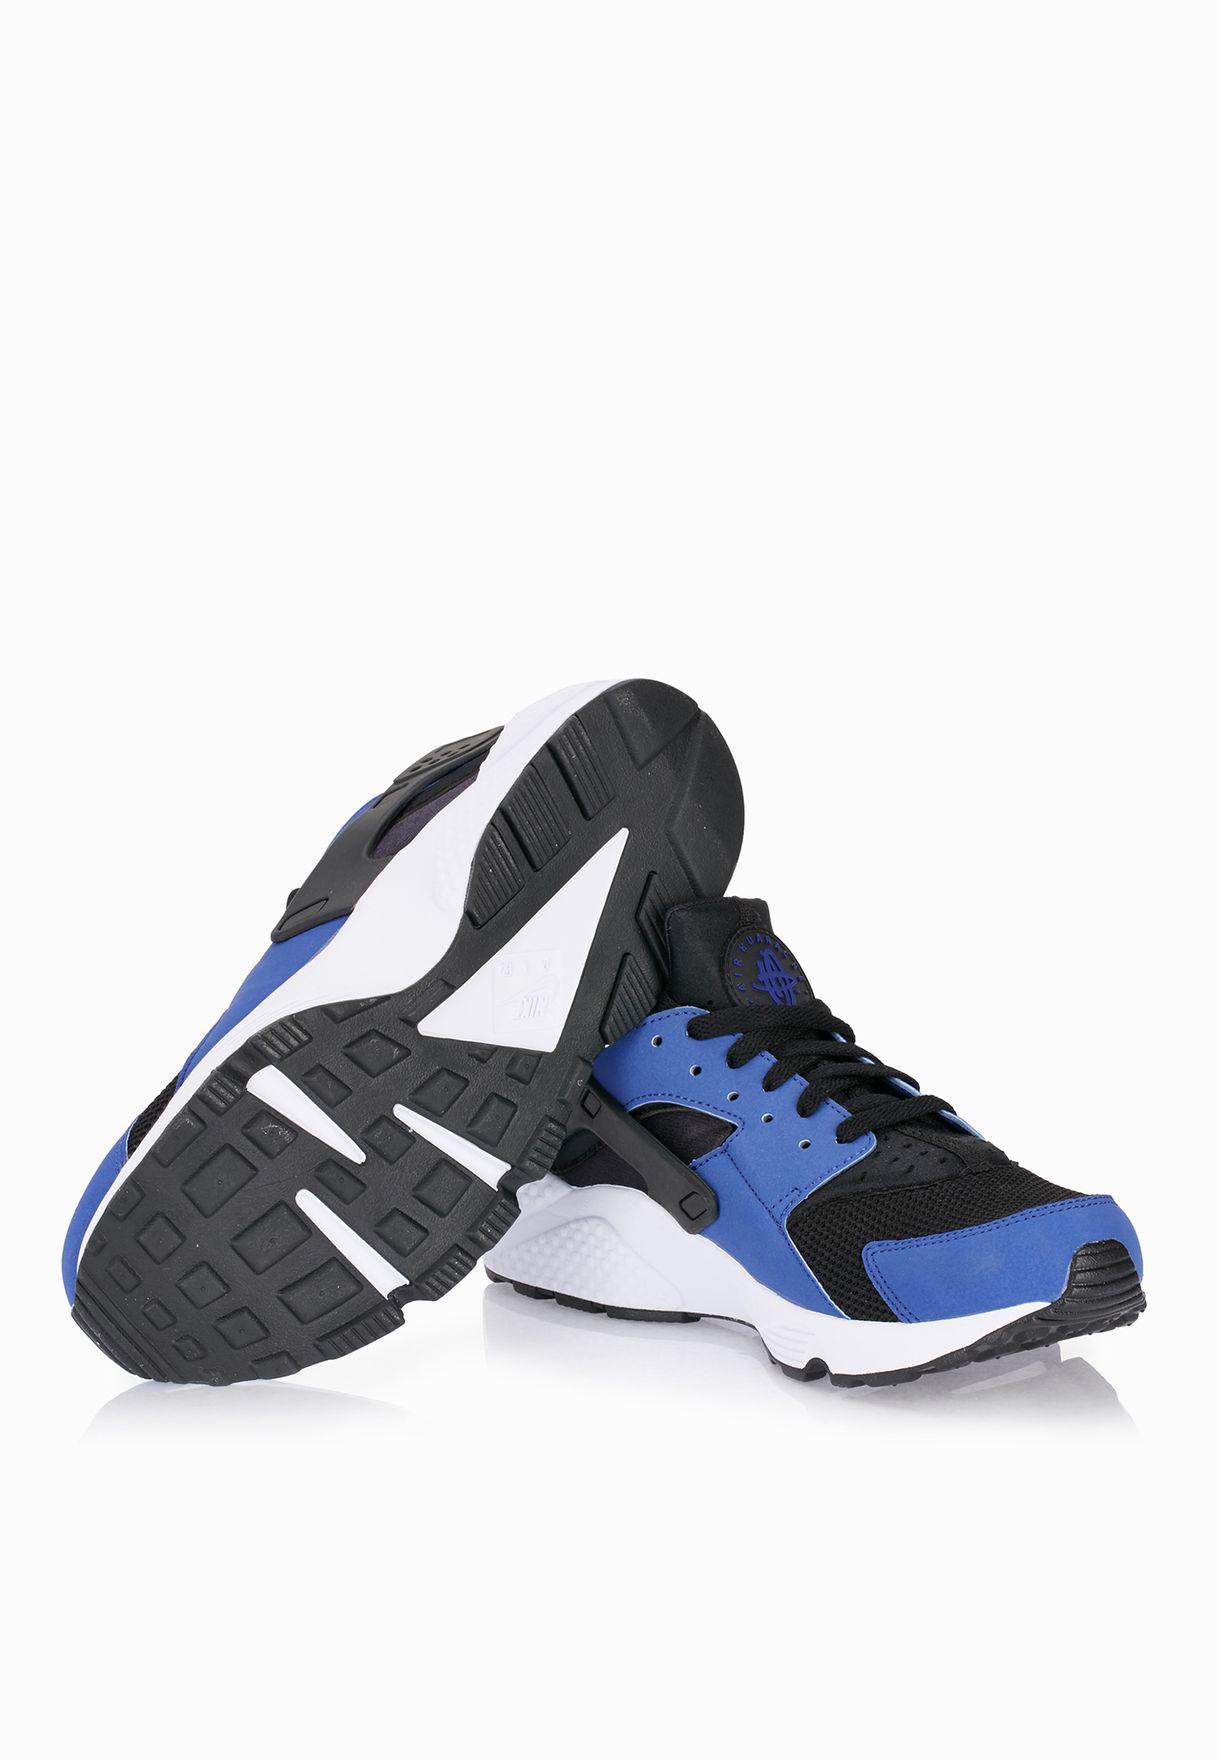 54a17a02aa Shop Nike multicolor Air Huarache 318429-411 for Men in Kuwait ...